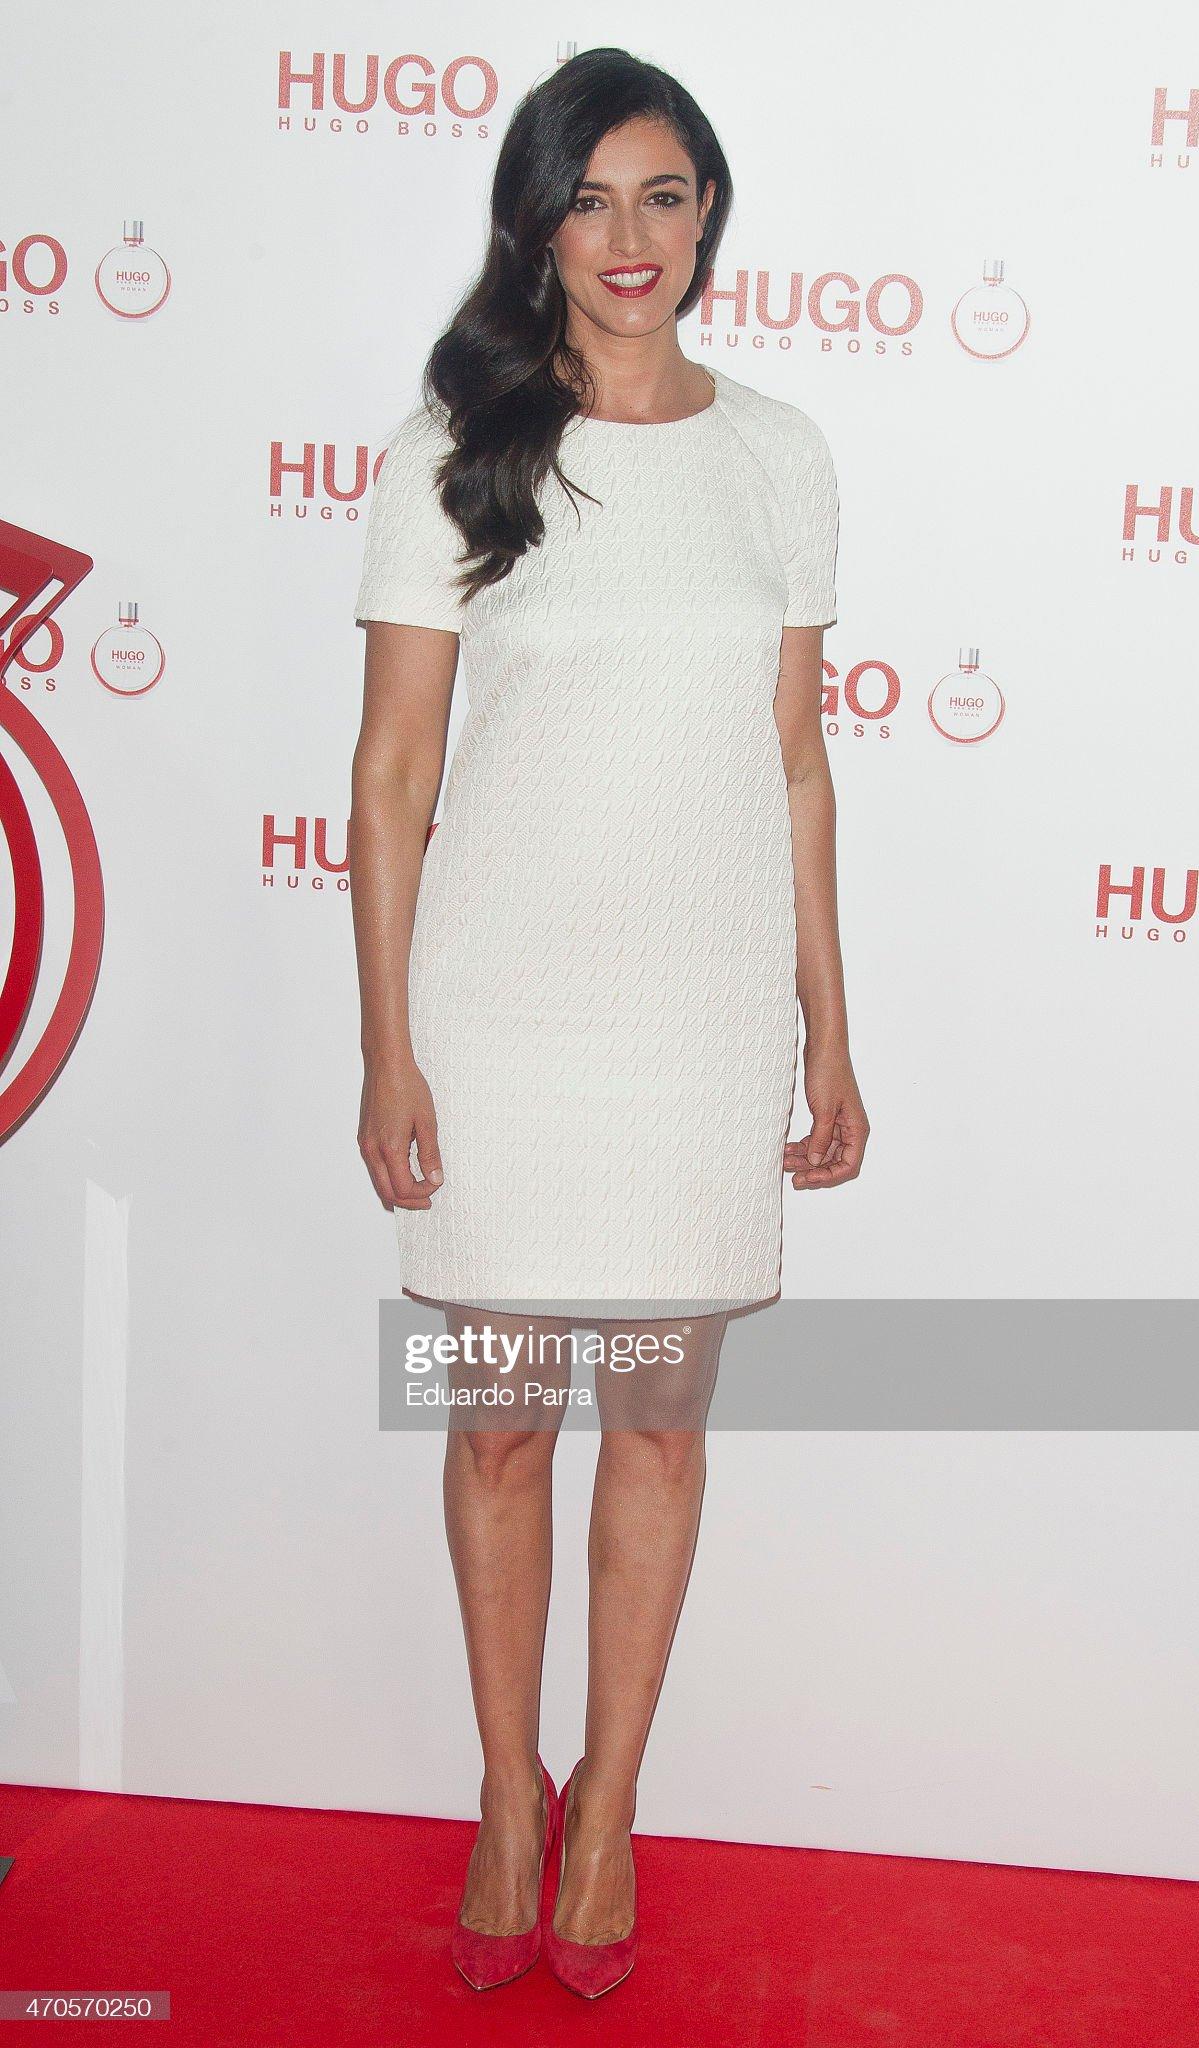 ¿Cuánto mide Blanca Romero? - Altura Actress-blanca-romero-attends-hugo-boss-woman-fragrance-presentation-picture-id470570250?s=2048x2048